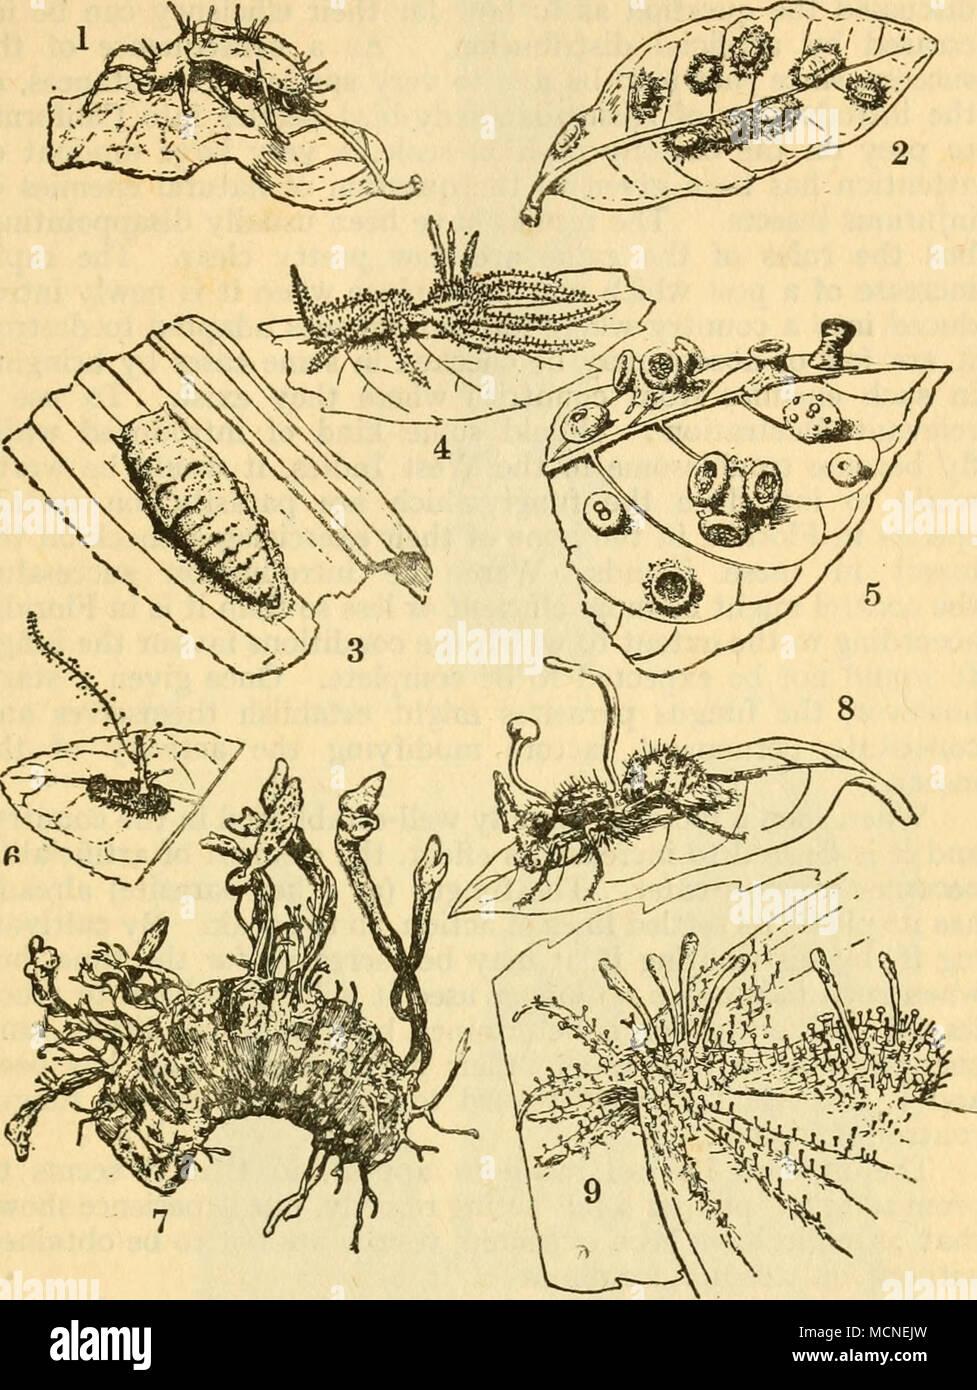 . Fig. 19 ENTOMOGENOUS FuNGI 1 HiRsuTELLA ENTOMOPHiLA on a beetle (Colaspis sp.). 2 Cephalosporium Lecanii on Coccus sp. 3 Metarrhizium Anisopliae on a Homopteron, probably a Jassid. 4 Gibellula arachnophila on a spider. 5 Aschersonia turbinata on a scale insect. 6 Gibellula sp. 7 CoRDYCEPS sp. on larva of Rhinoceros Beetle (Strategus). 8 Cordyceps Lloydii on an ant (Campanotus sp.). 9 IsARiA Sphingum ou a moth. - Stock Image